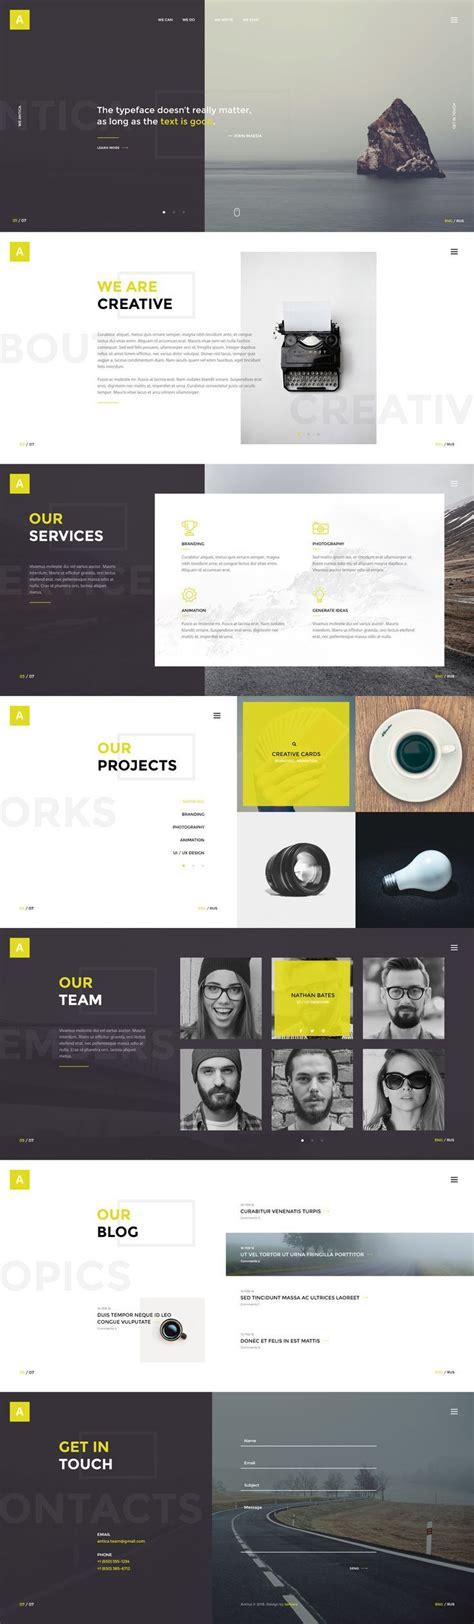 25 web design firm ideas on web best 25 web design ideas on website design Best